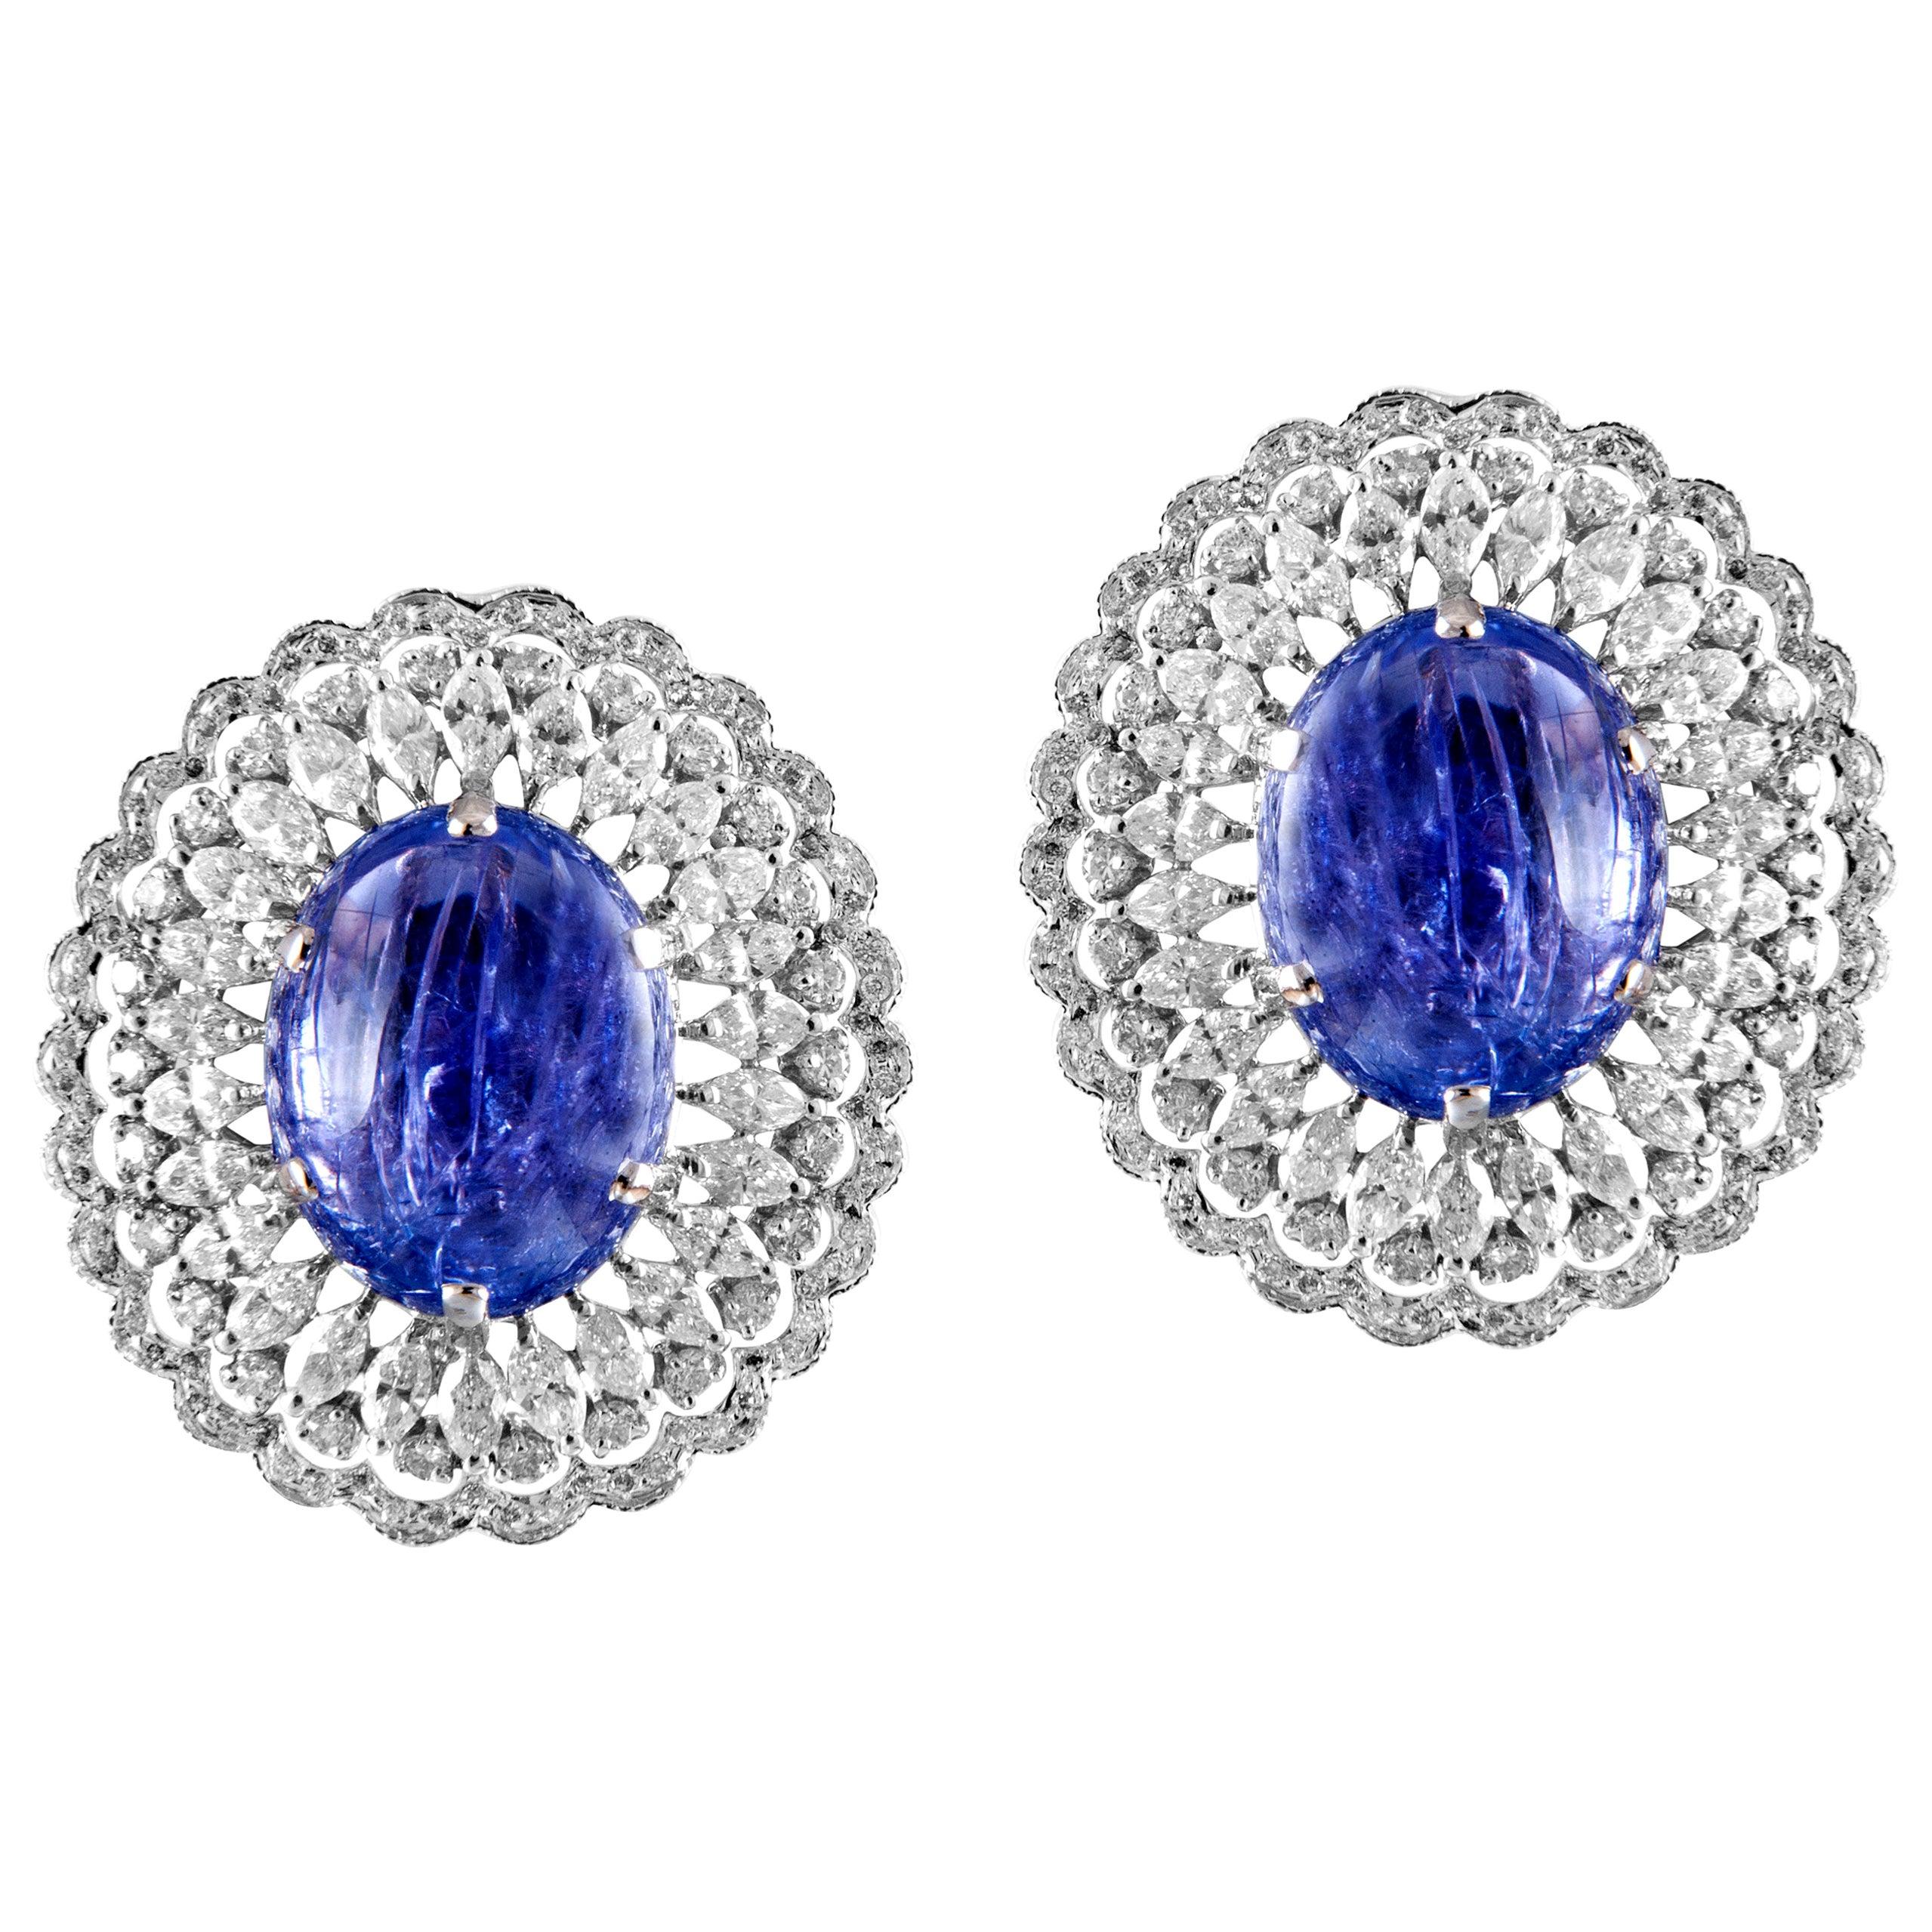 18 Karat White Gold White Diamond Tanzanite Stud Earrings